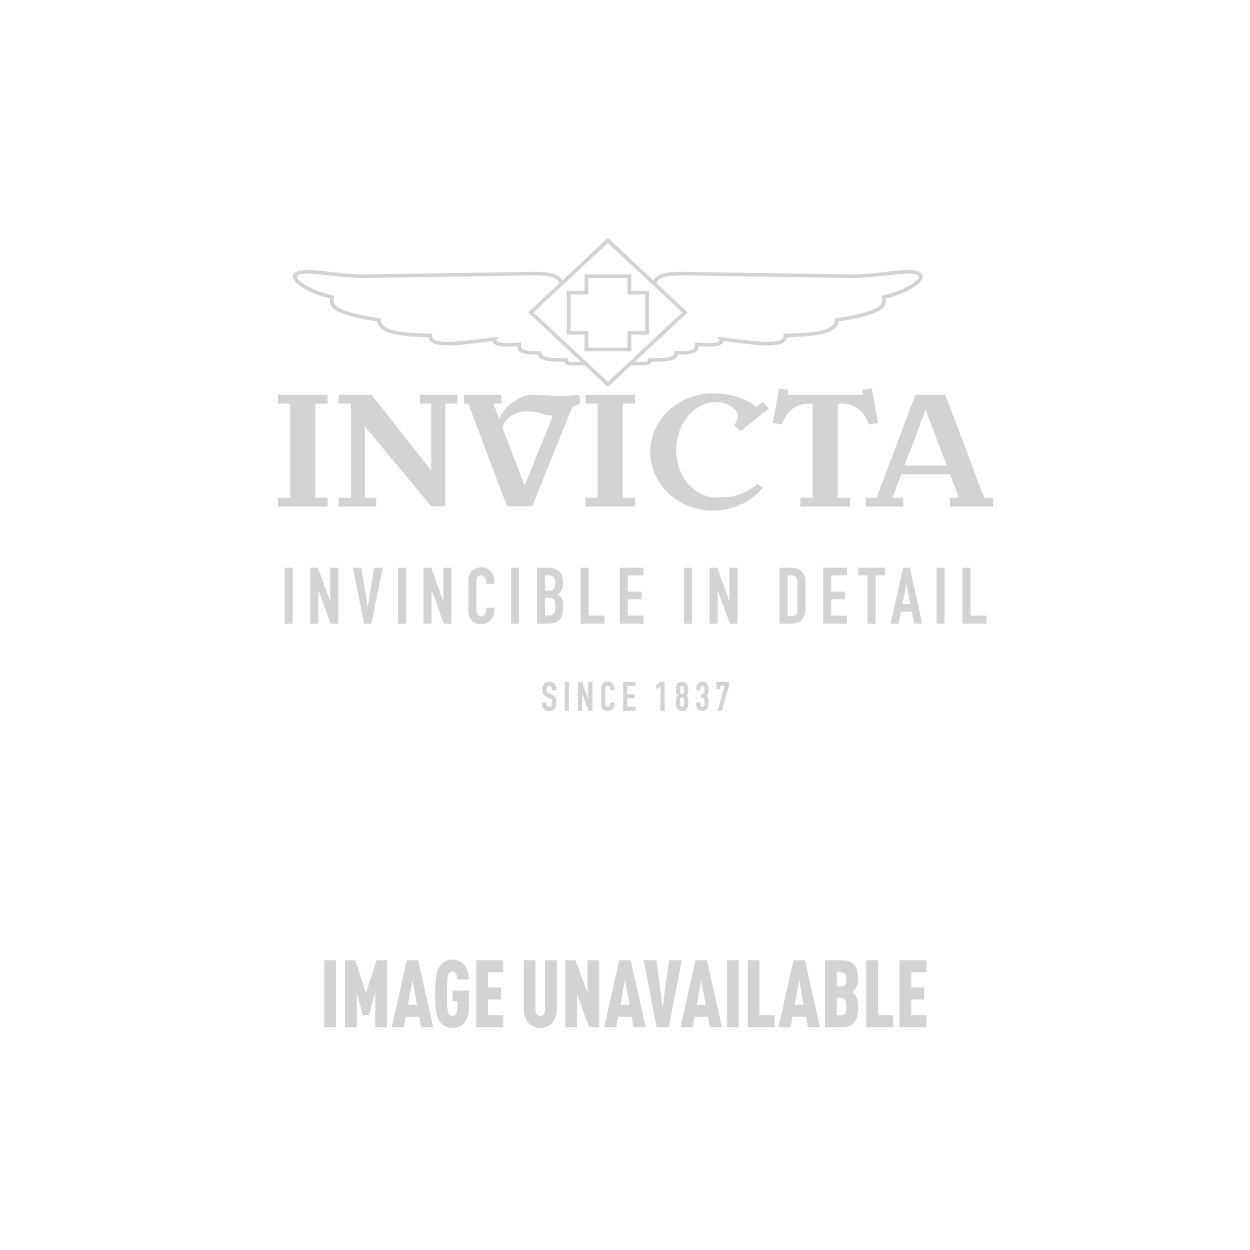 Invicta Corduba Swiss Movement Quartz Watch - Gunmetal case with Orange tone Leather band - Model 90208